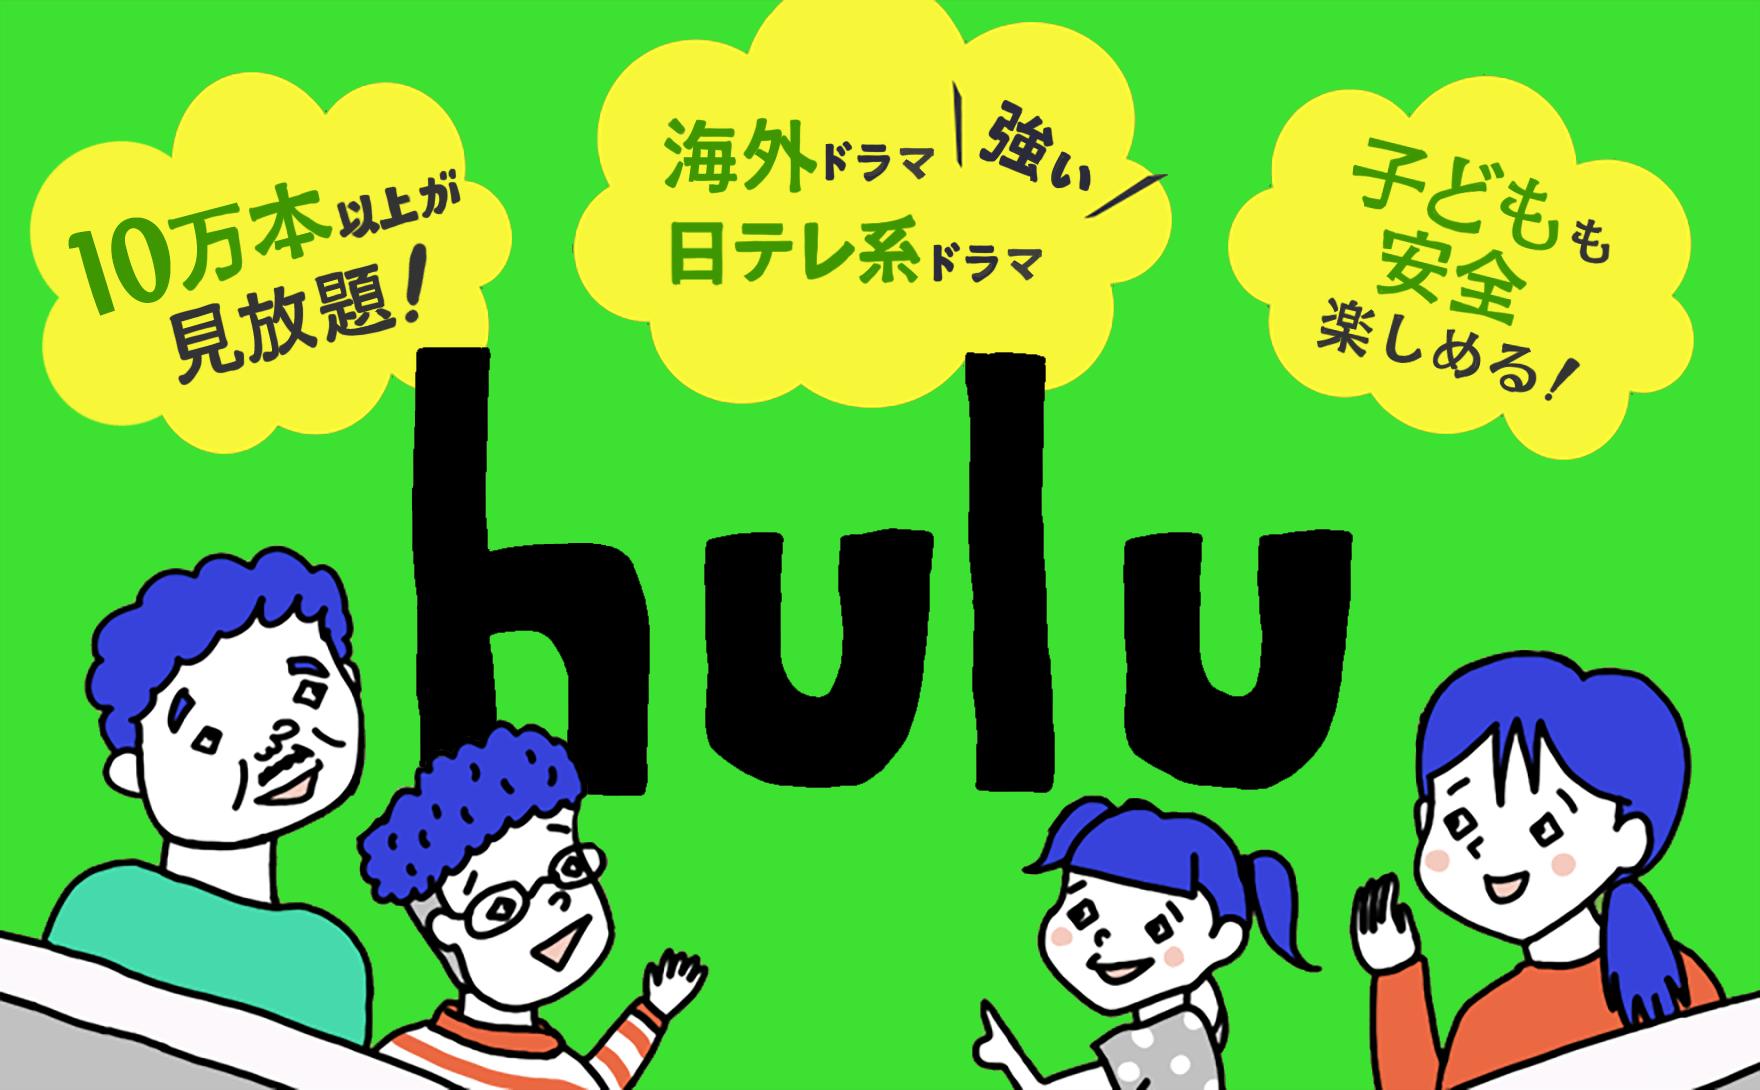 Hulu/フールーのメリット・デメリット、評価・評判をわかりやすく解説